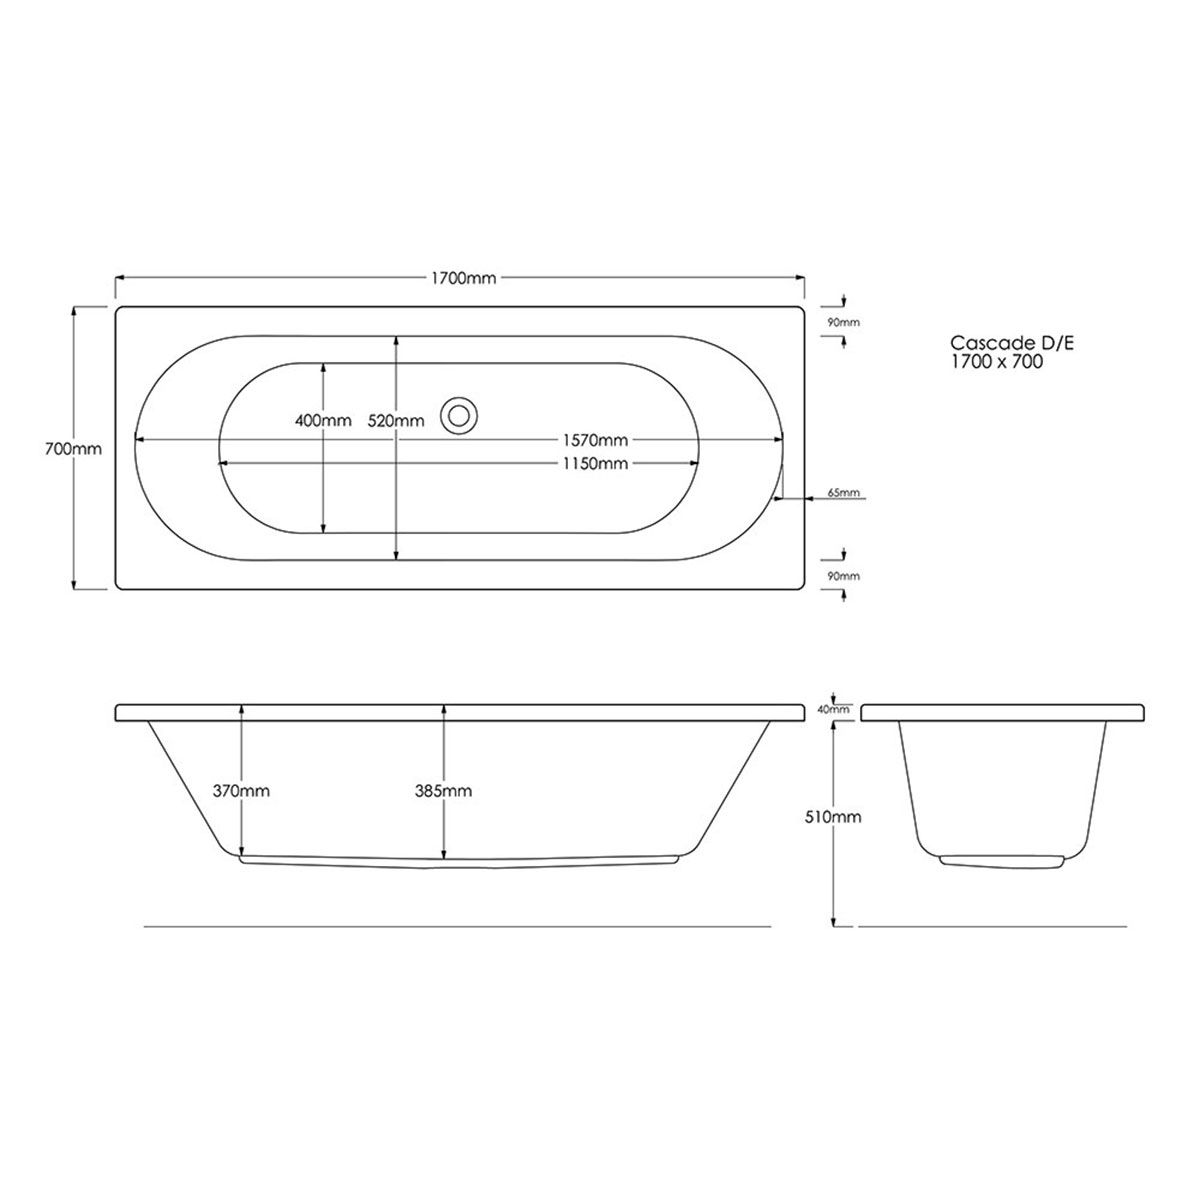 Trojan Cascade Double Ended Bath 1700 x 700 Dimensions